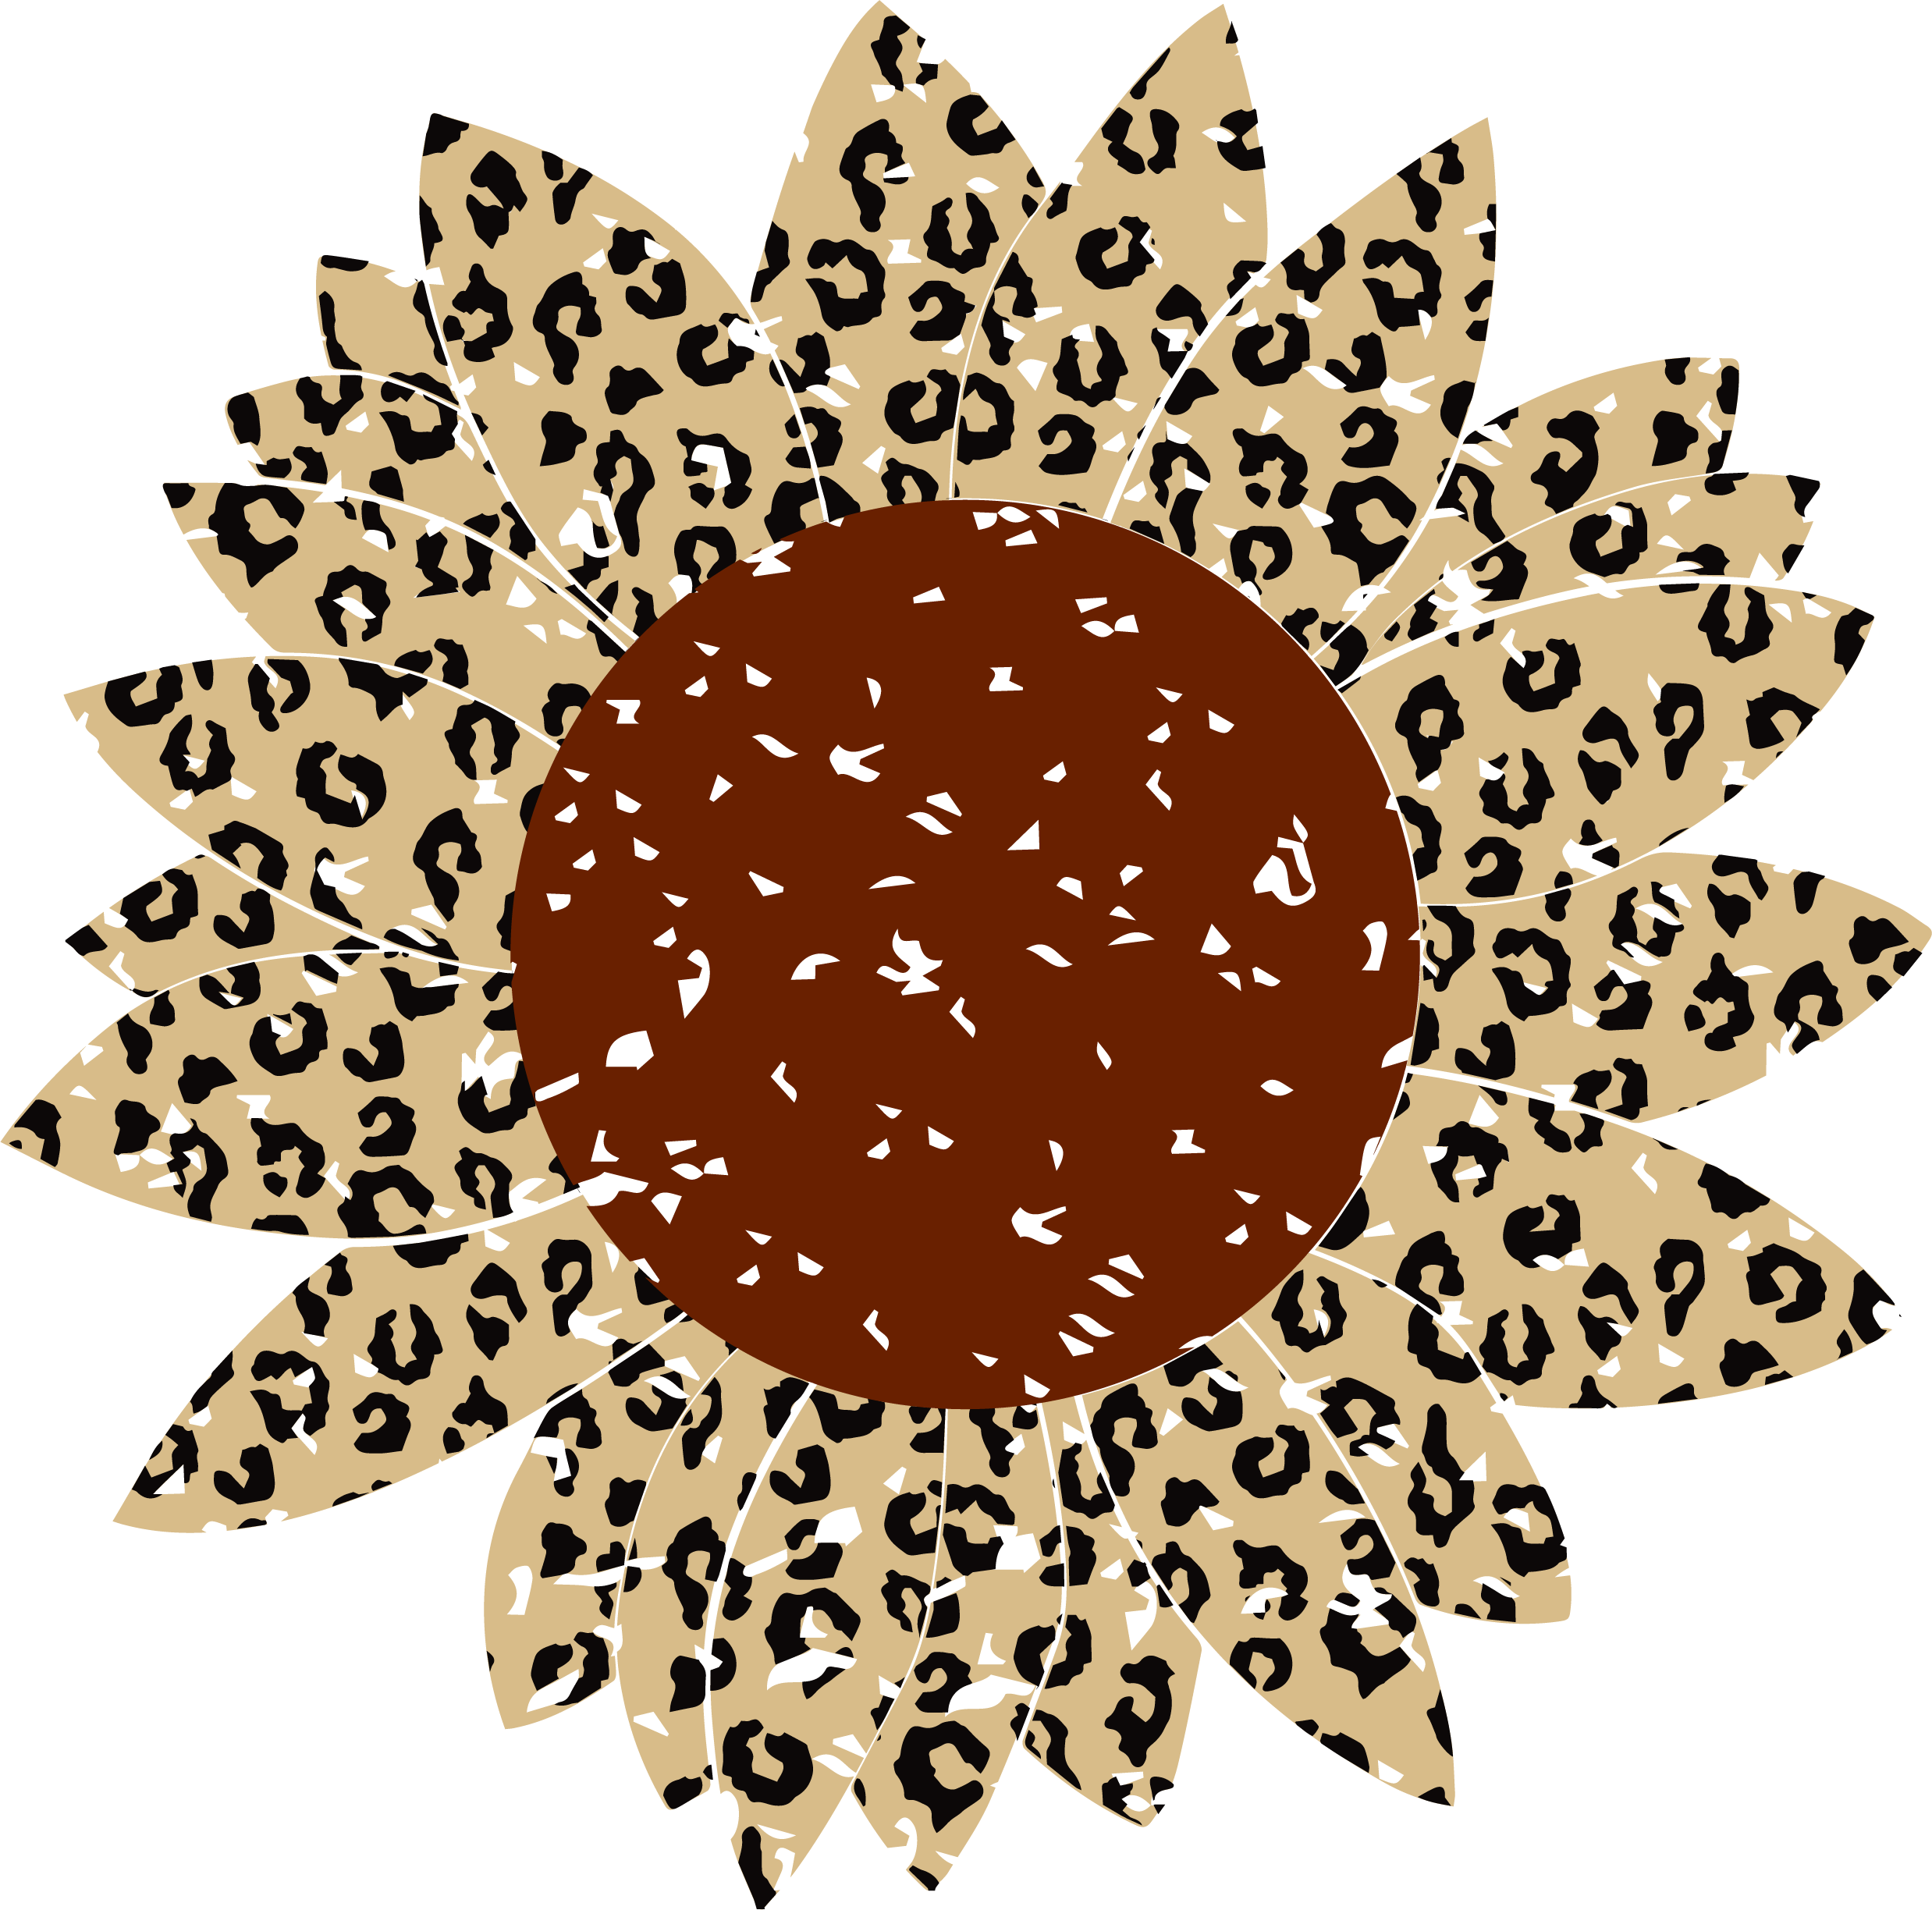 Download Sunflower Grunge Svg, Leopard Print Svg By Crafty Mama ...